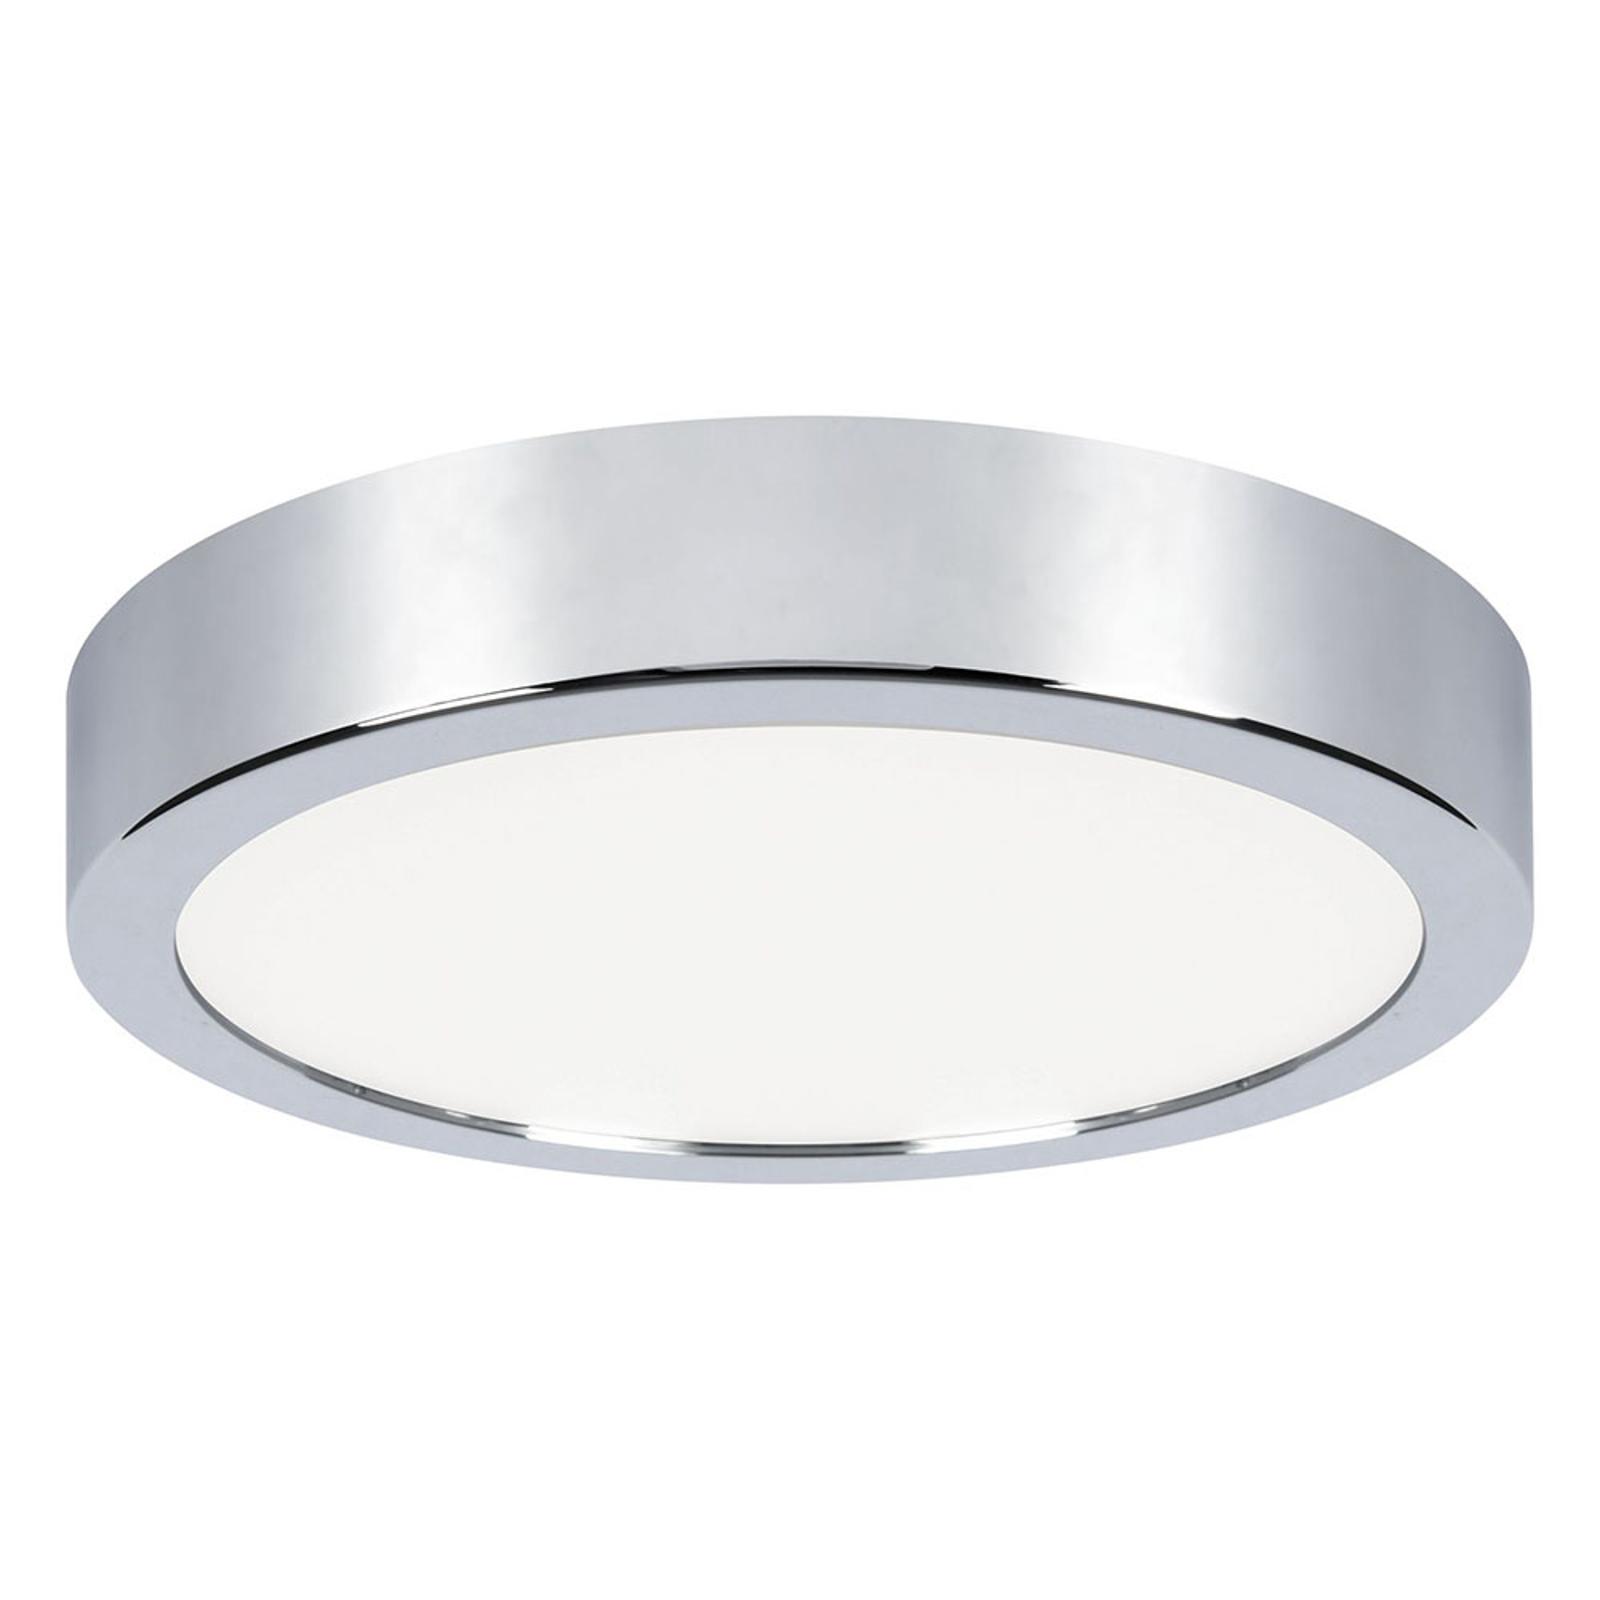 Paulmann Aviar LED-Deckenlampe WhiteSwitch Ø 22cm